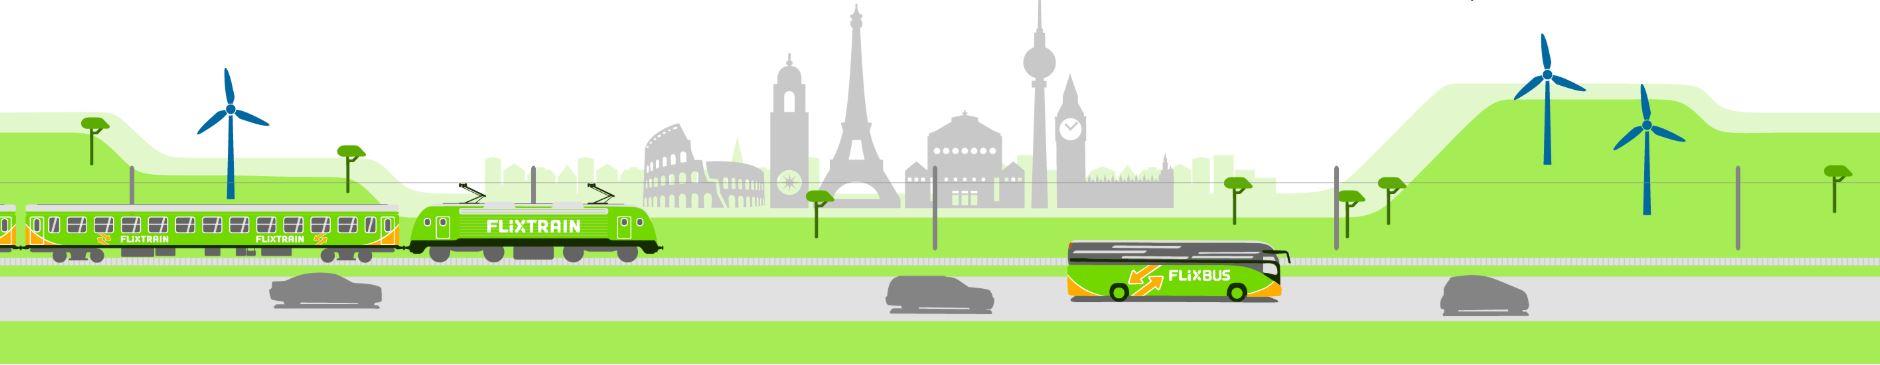 Flixbus Train